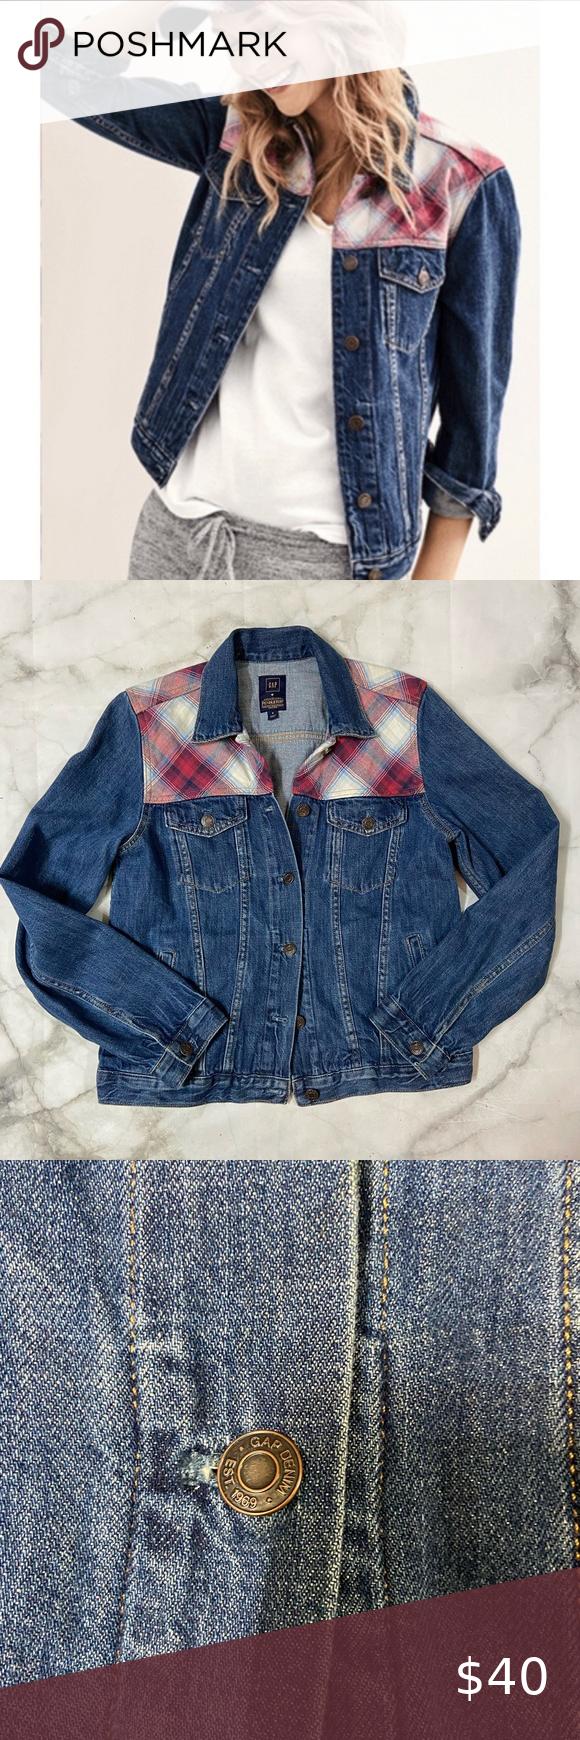 Gap Pendleton Jean Jacket With Flannel Detail Cotton Twill Jacket Coats Jackets Women Blue Denim Jacket [ 1740 x 580 Pixel ]